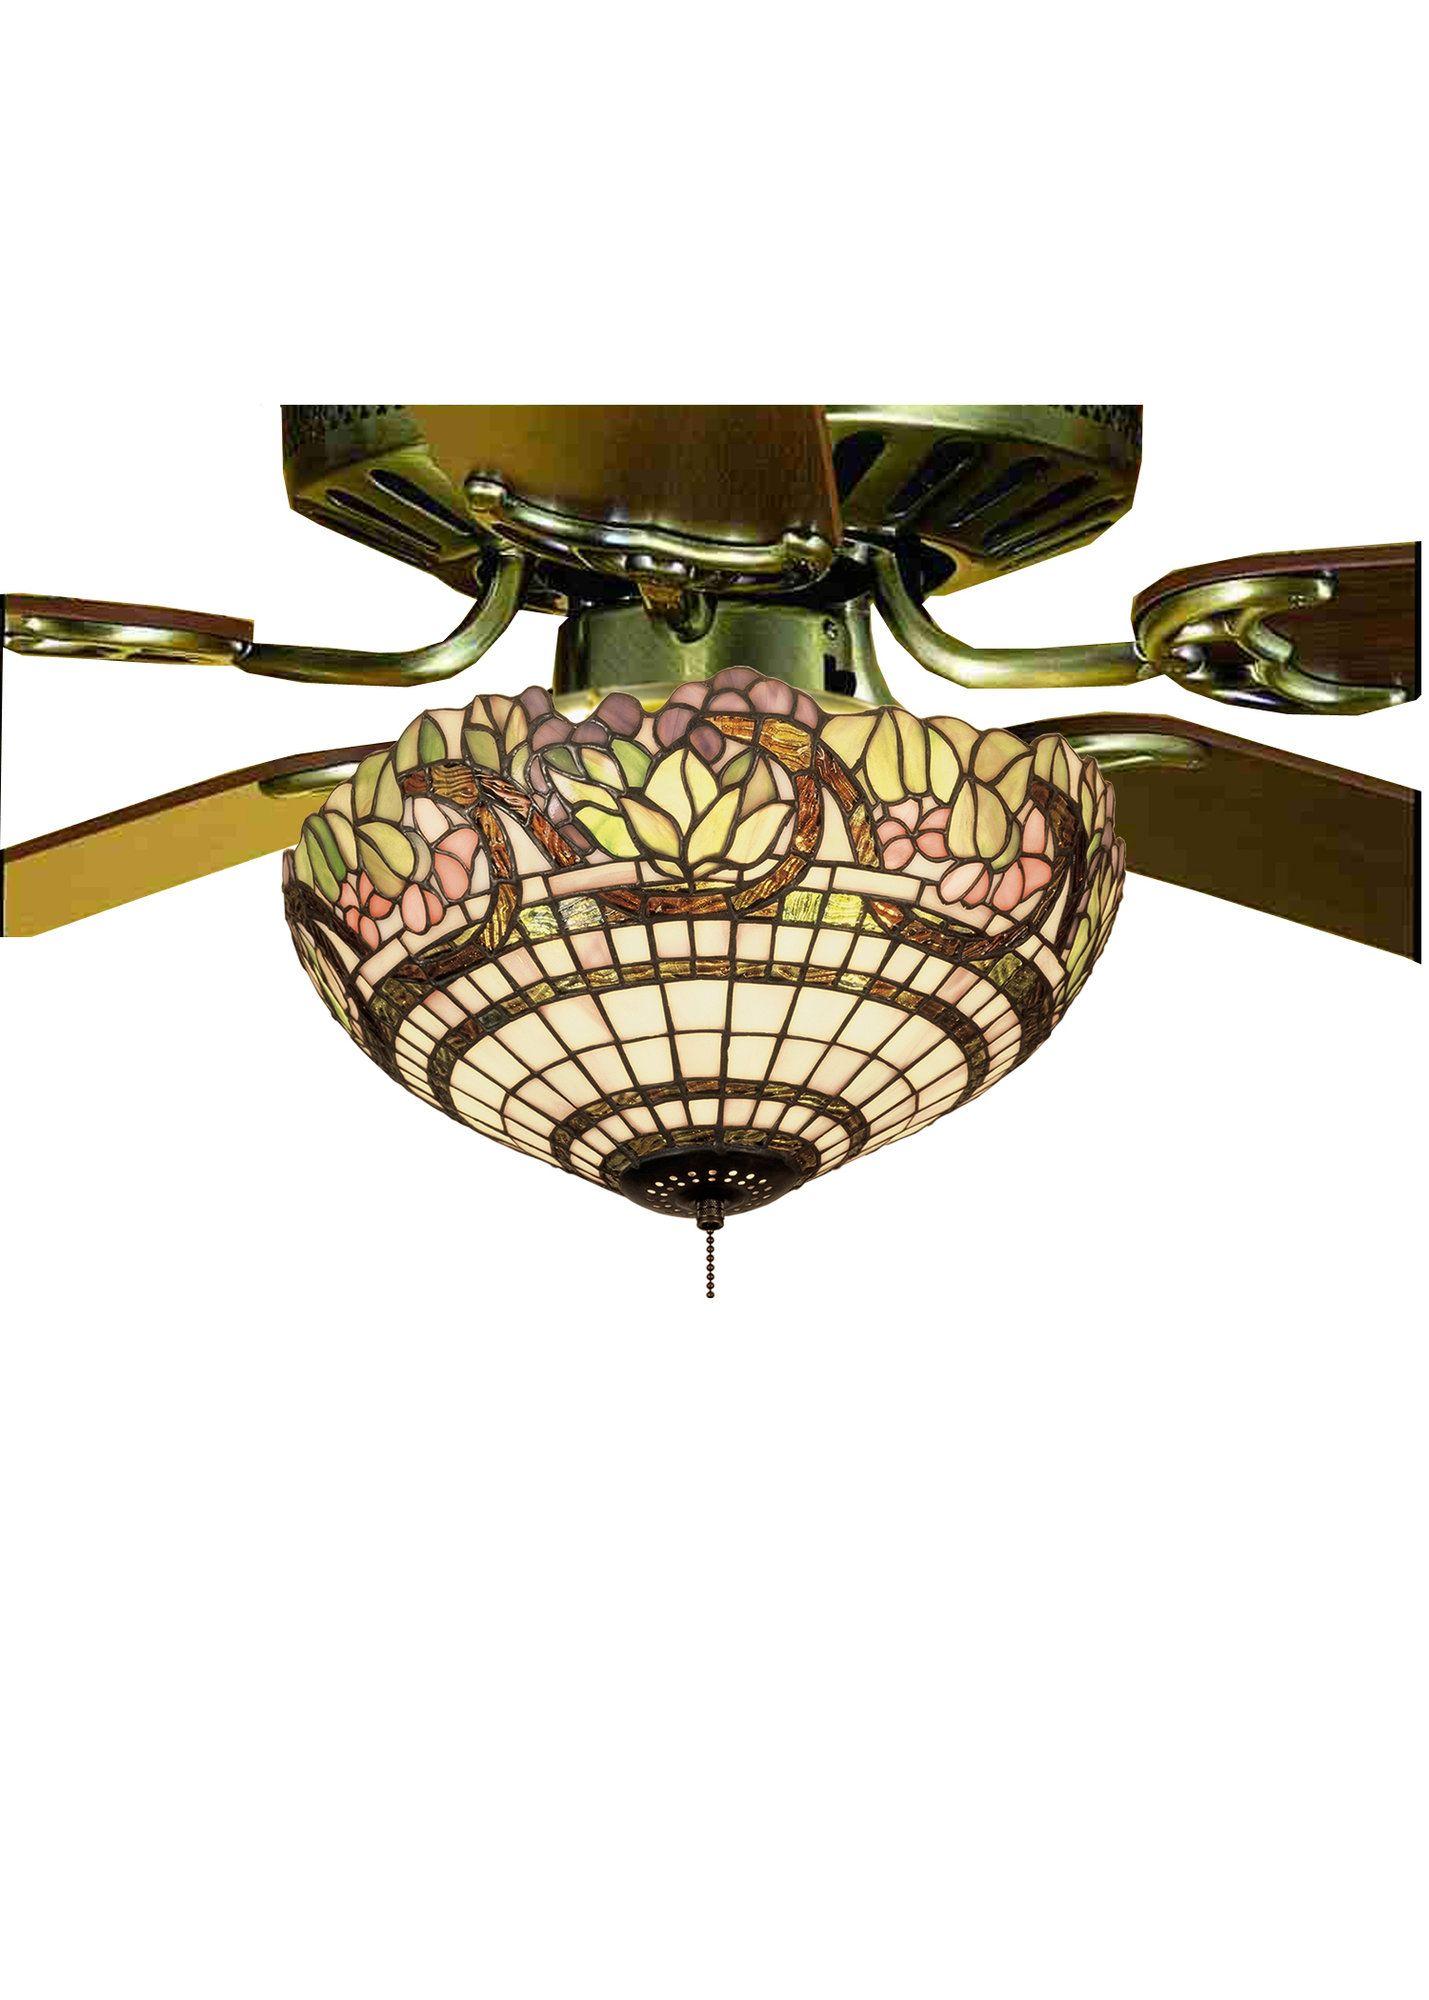 Handel Grapevine 3 Light Bowl Ceiling Fan Light Fixture